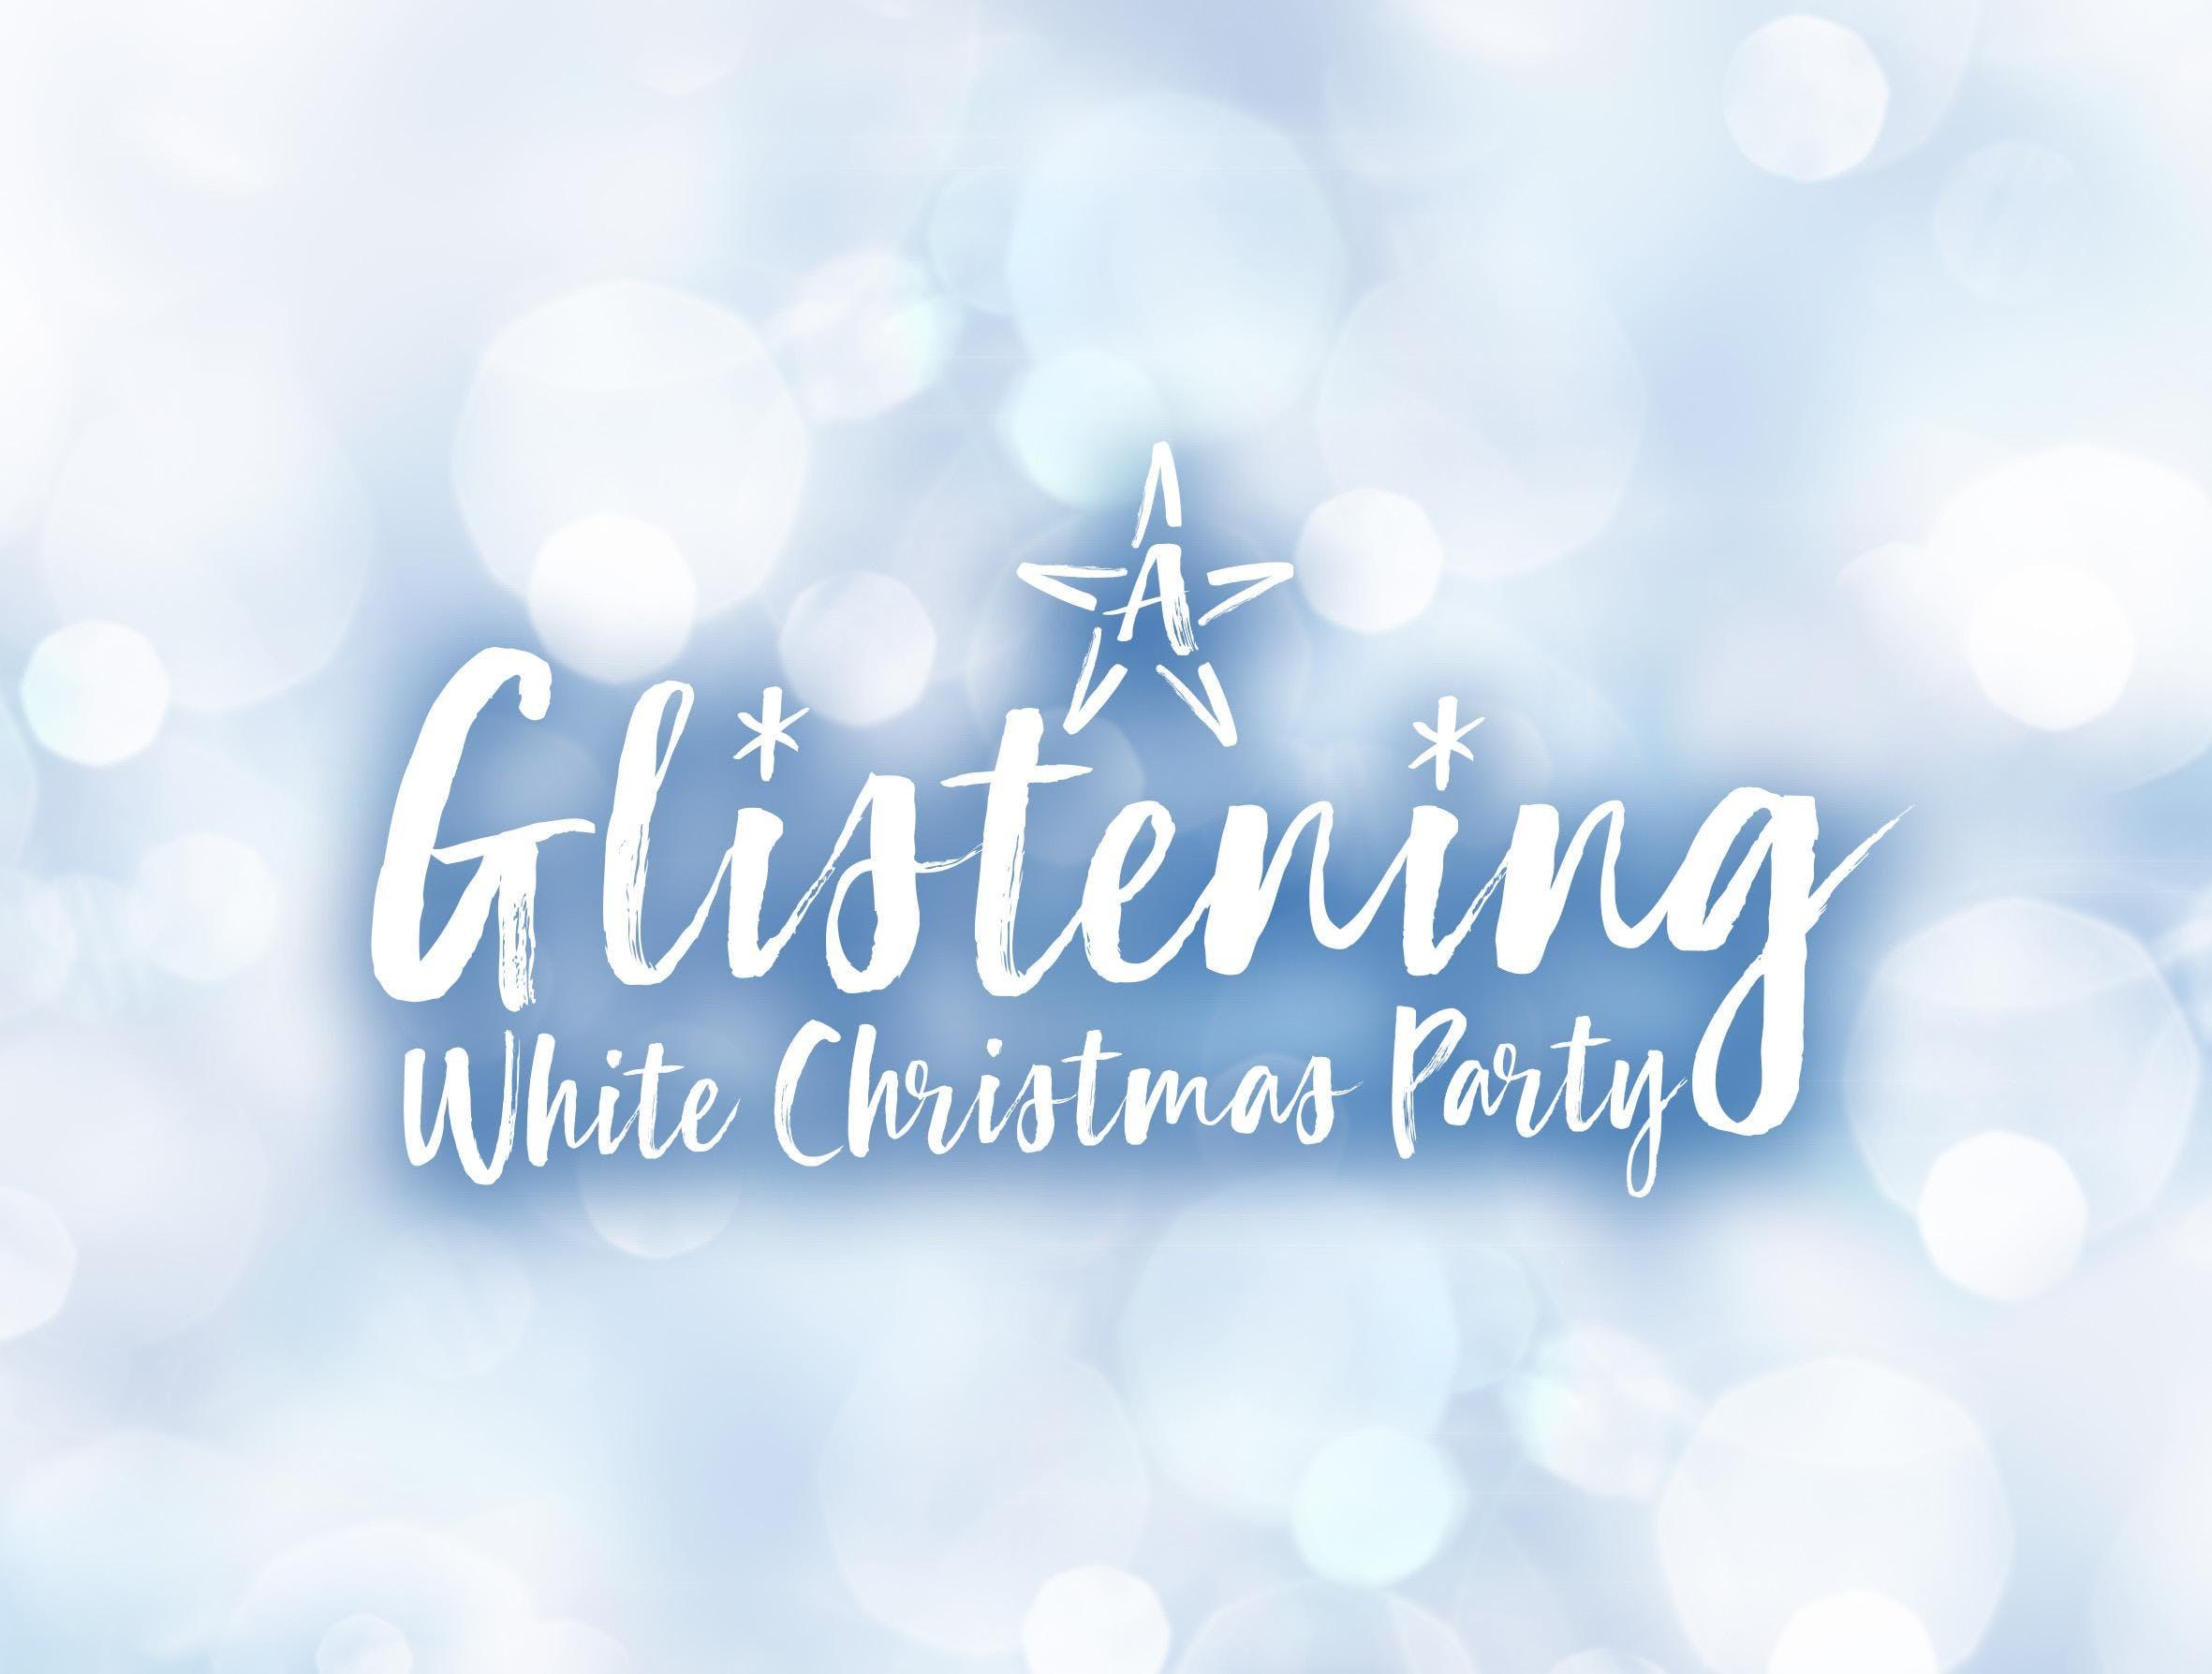 Glistening White Christmas Party Night